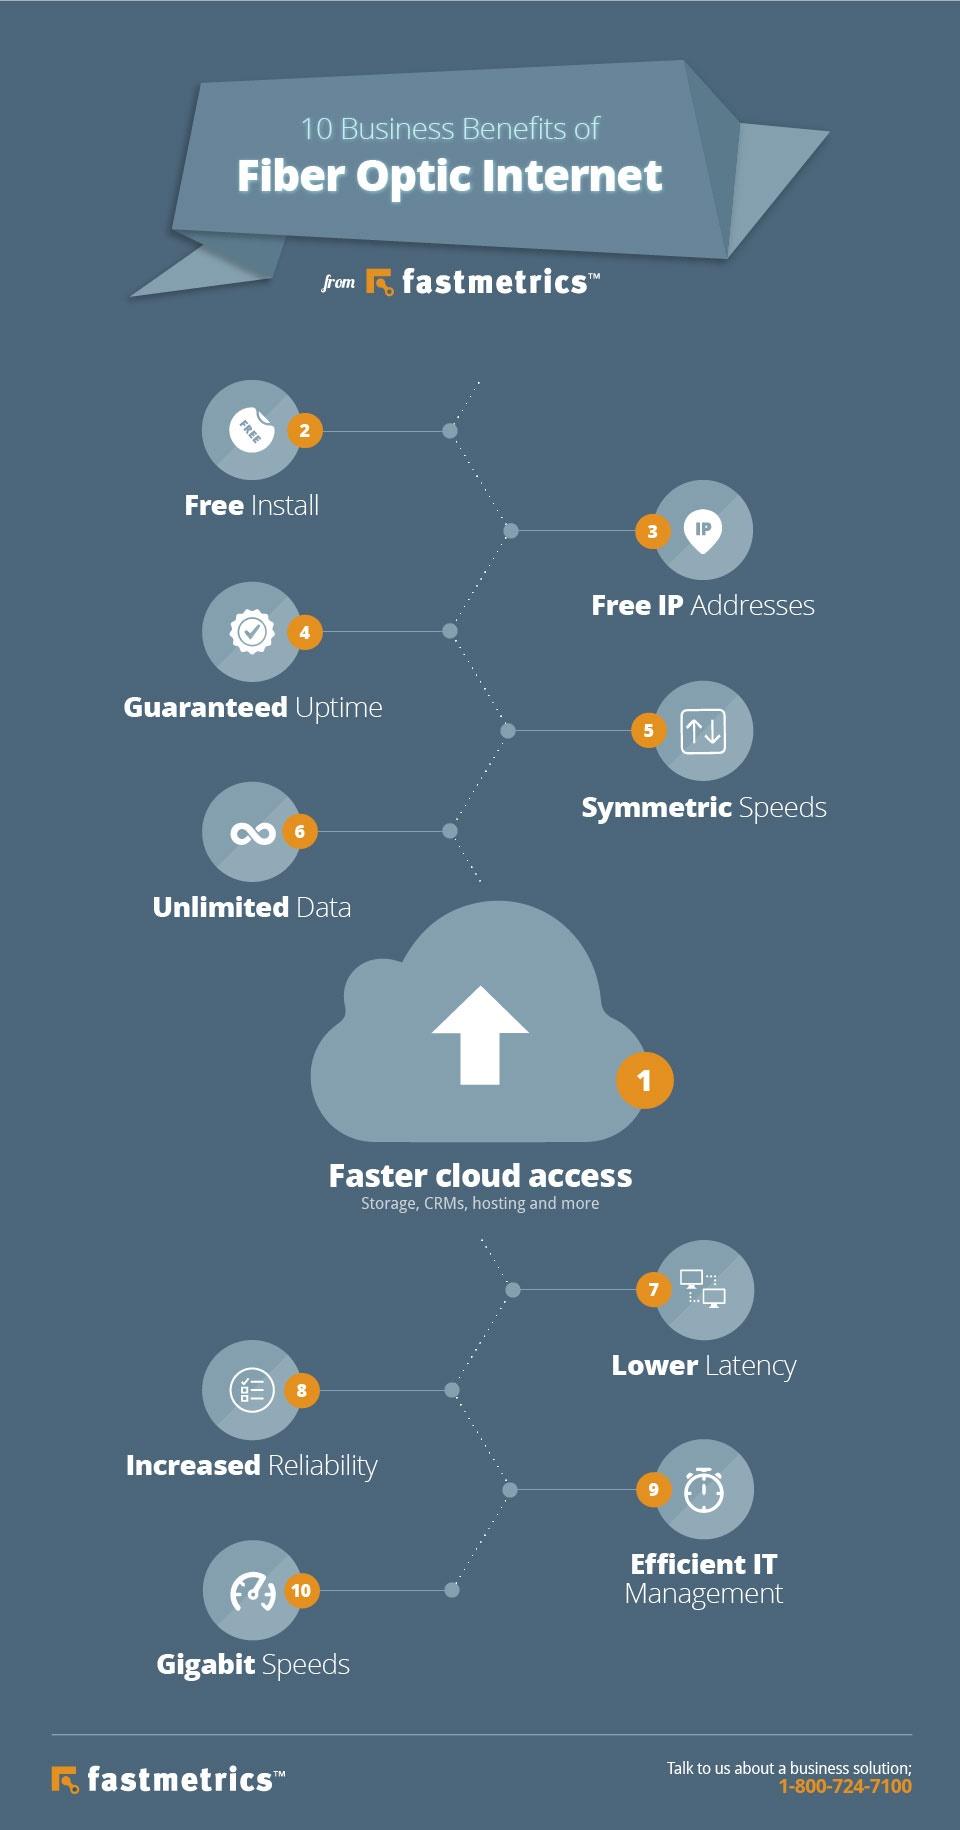 fiber optic internet service benefits infographic fastmetrics